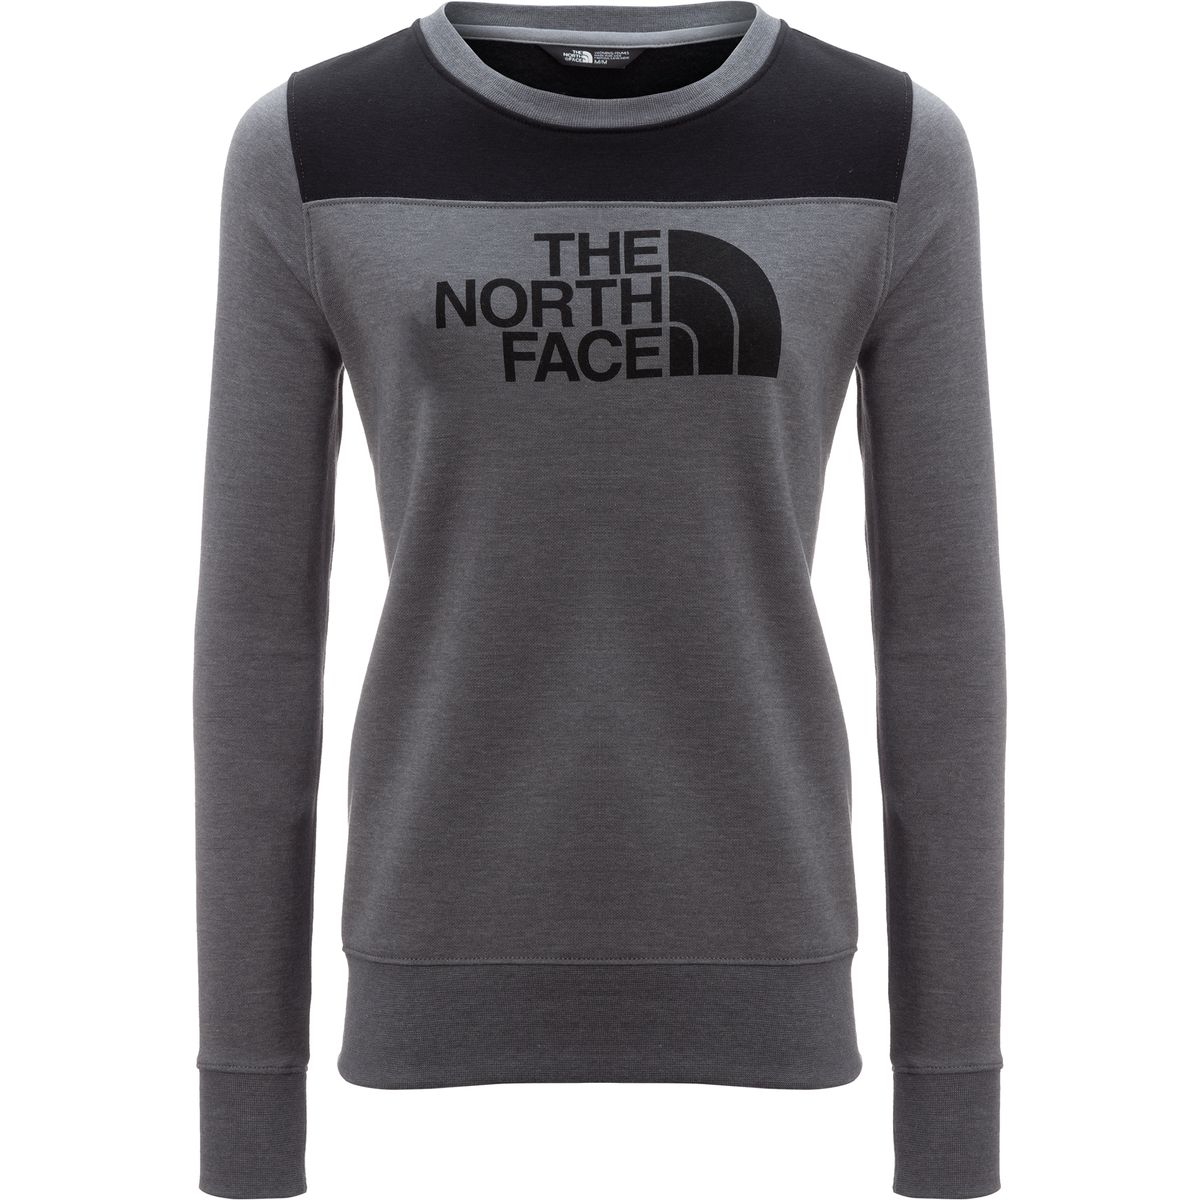 The North Face Half Dome Fleece Crew Pullover Sweatshirt - Women